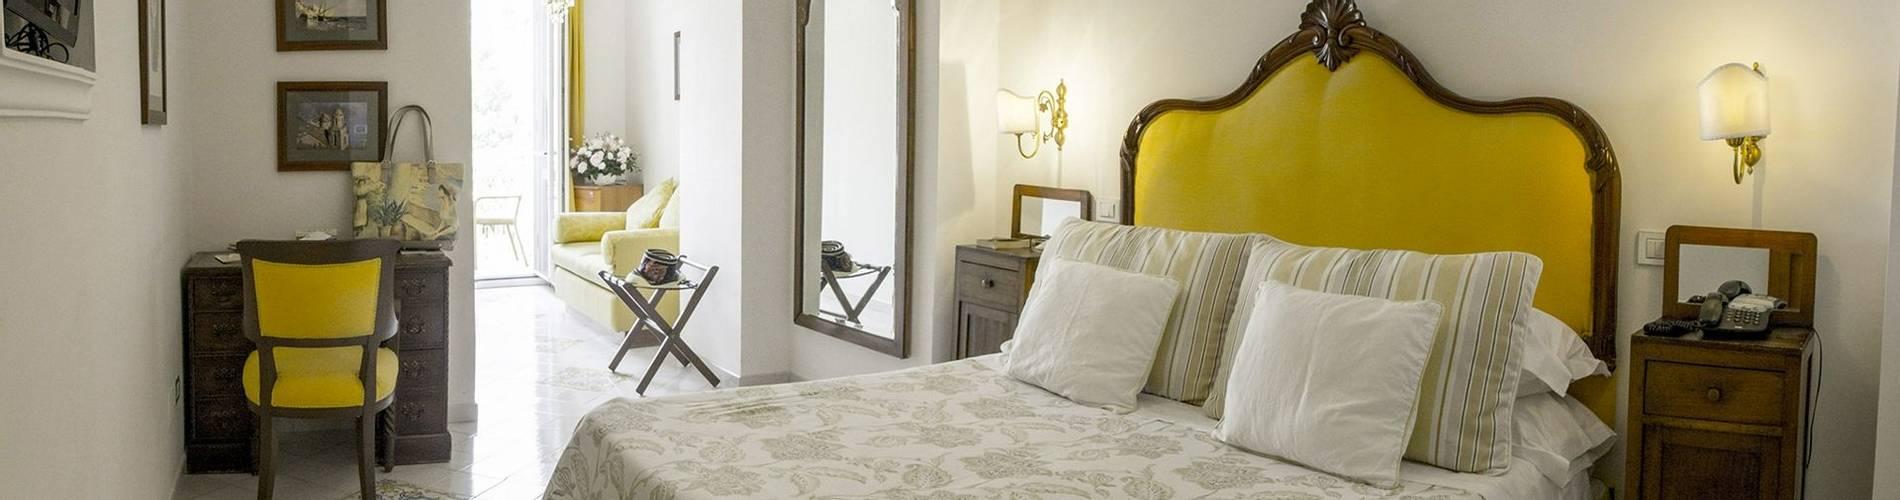 Villa Maria, Amalfi Coast, Italy, Standard room.jpg